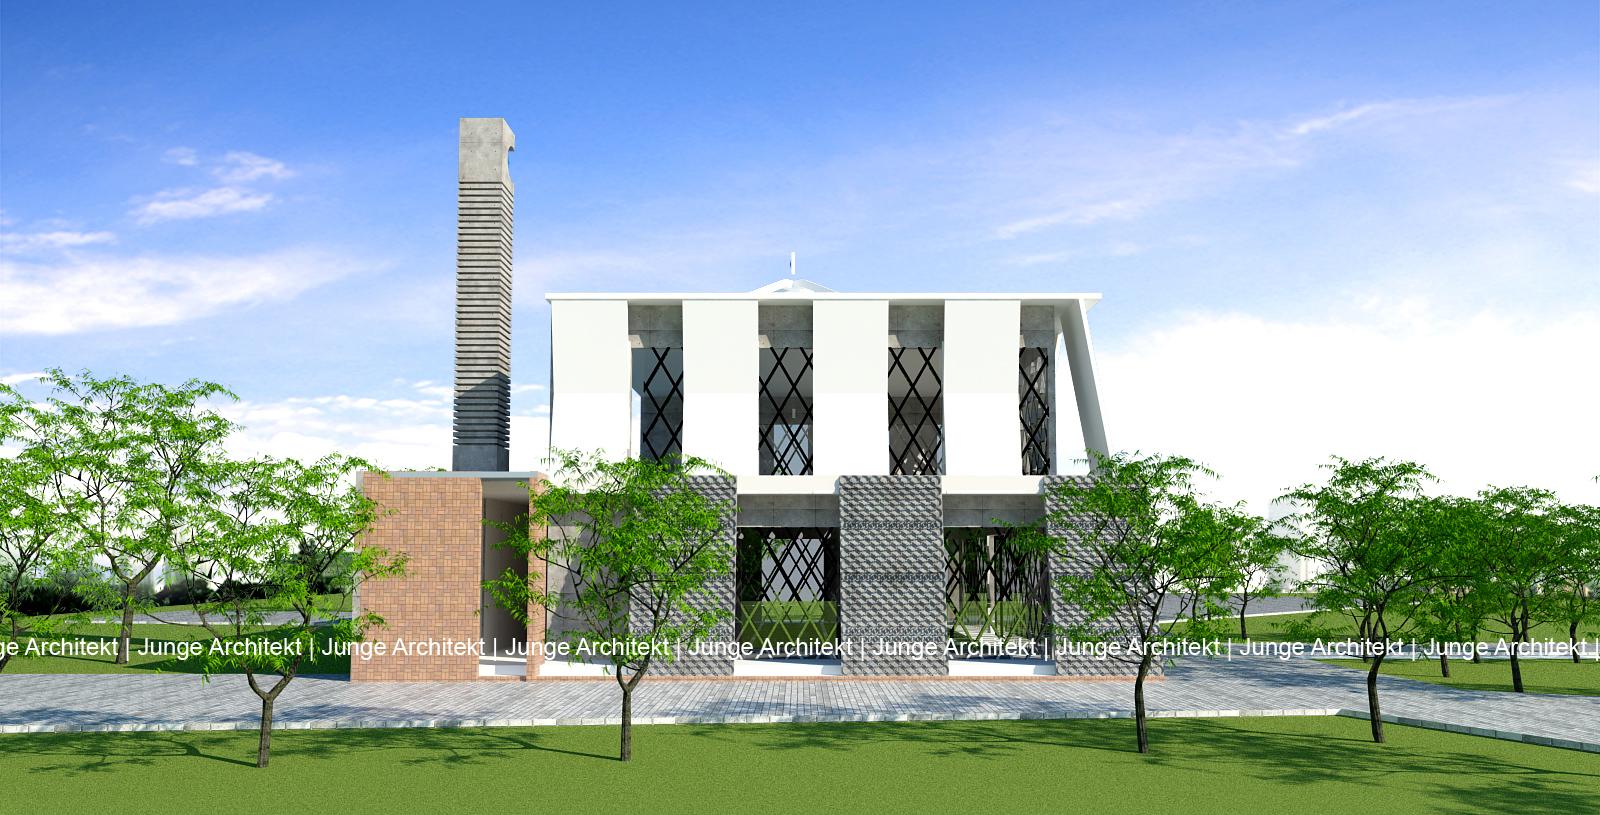 +berkonteks+alam,+Masjid+Di+Yogyakarta,+Masjid+konsep+modern,+Masjid ...